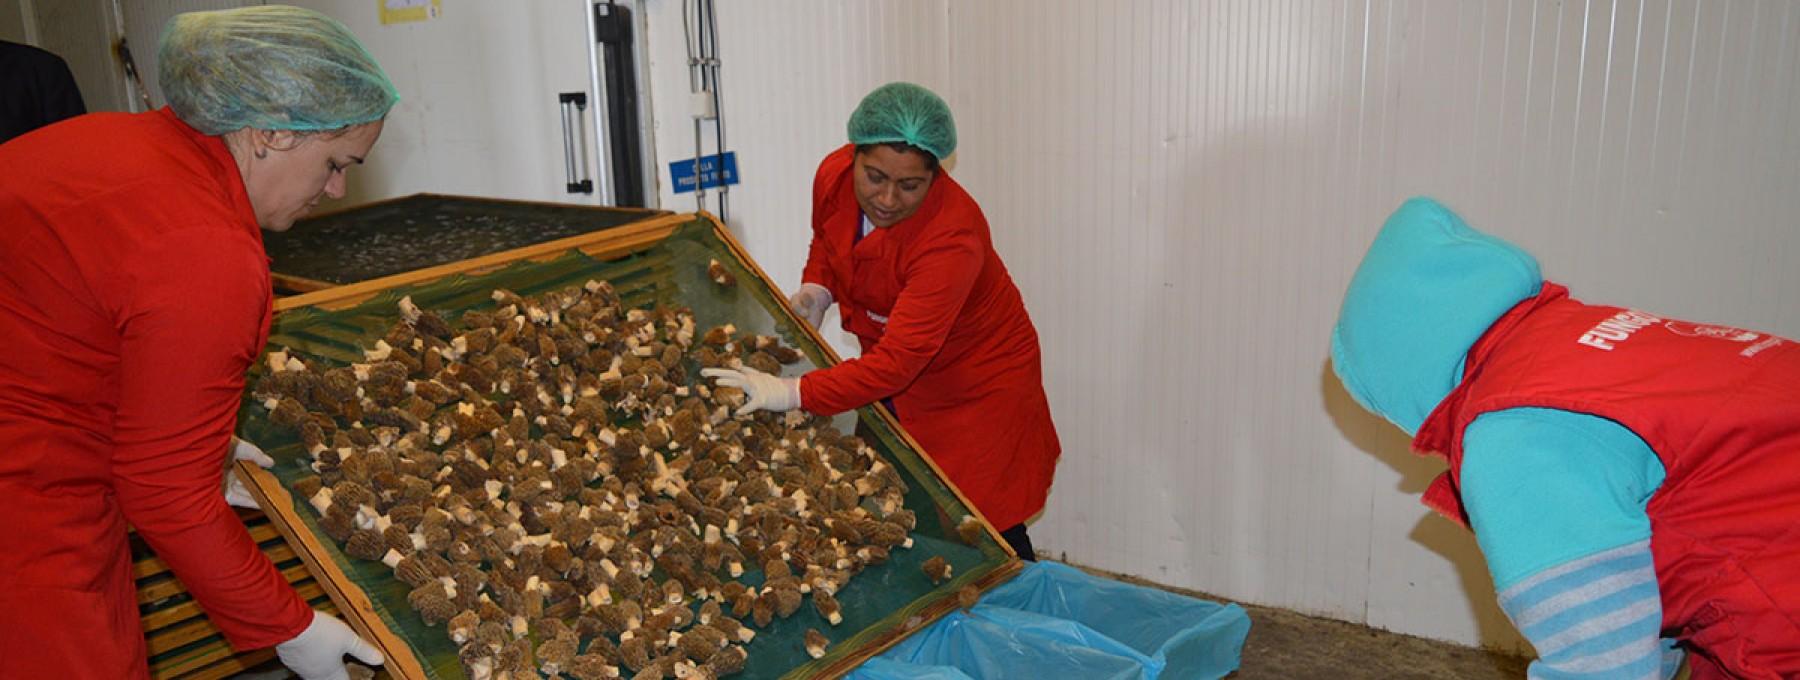 Kosovo Mushrooms Exported Worldwide